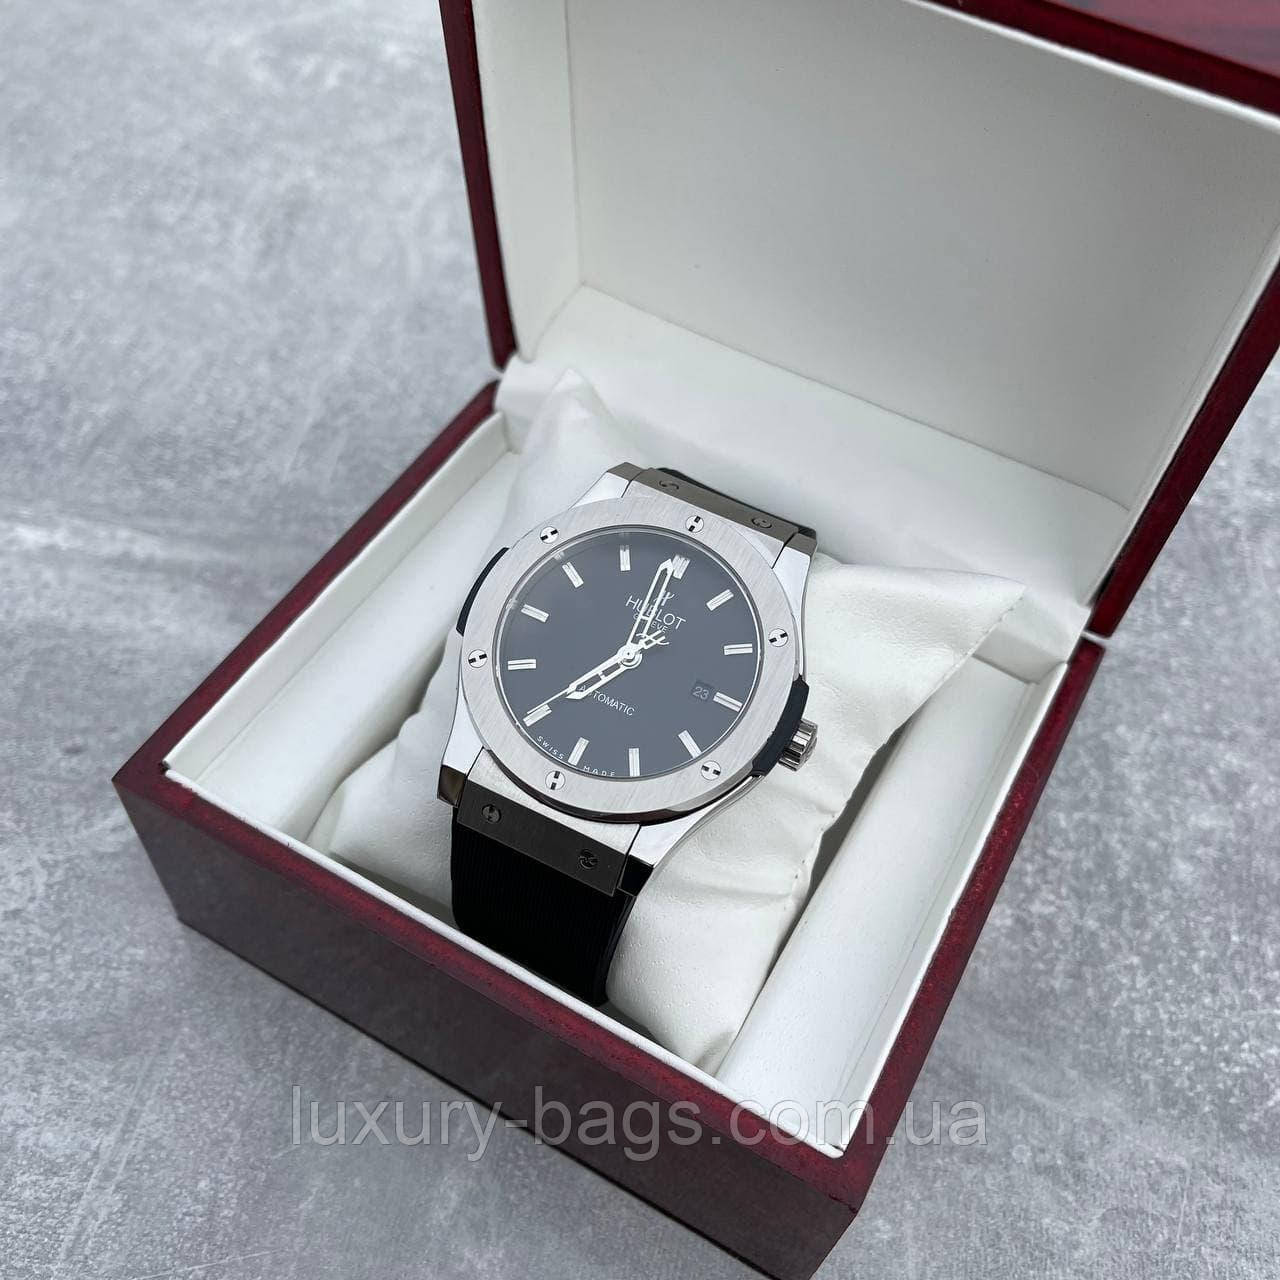 Годинники наручні Hubl0t 5826 Classic Fusion Black-Silver-Black